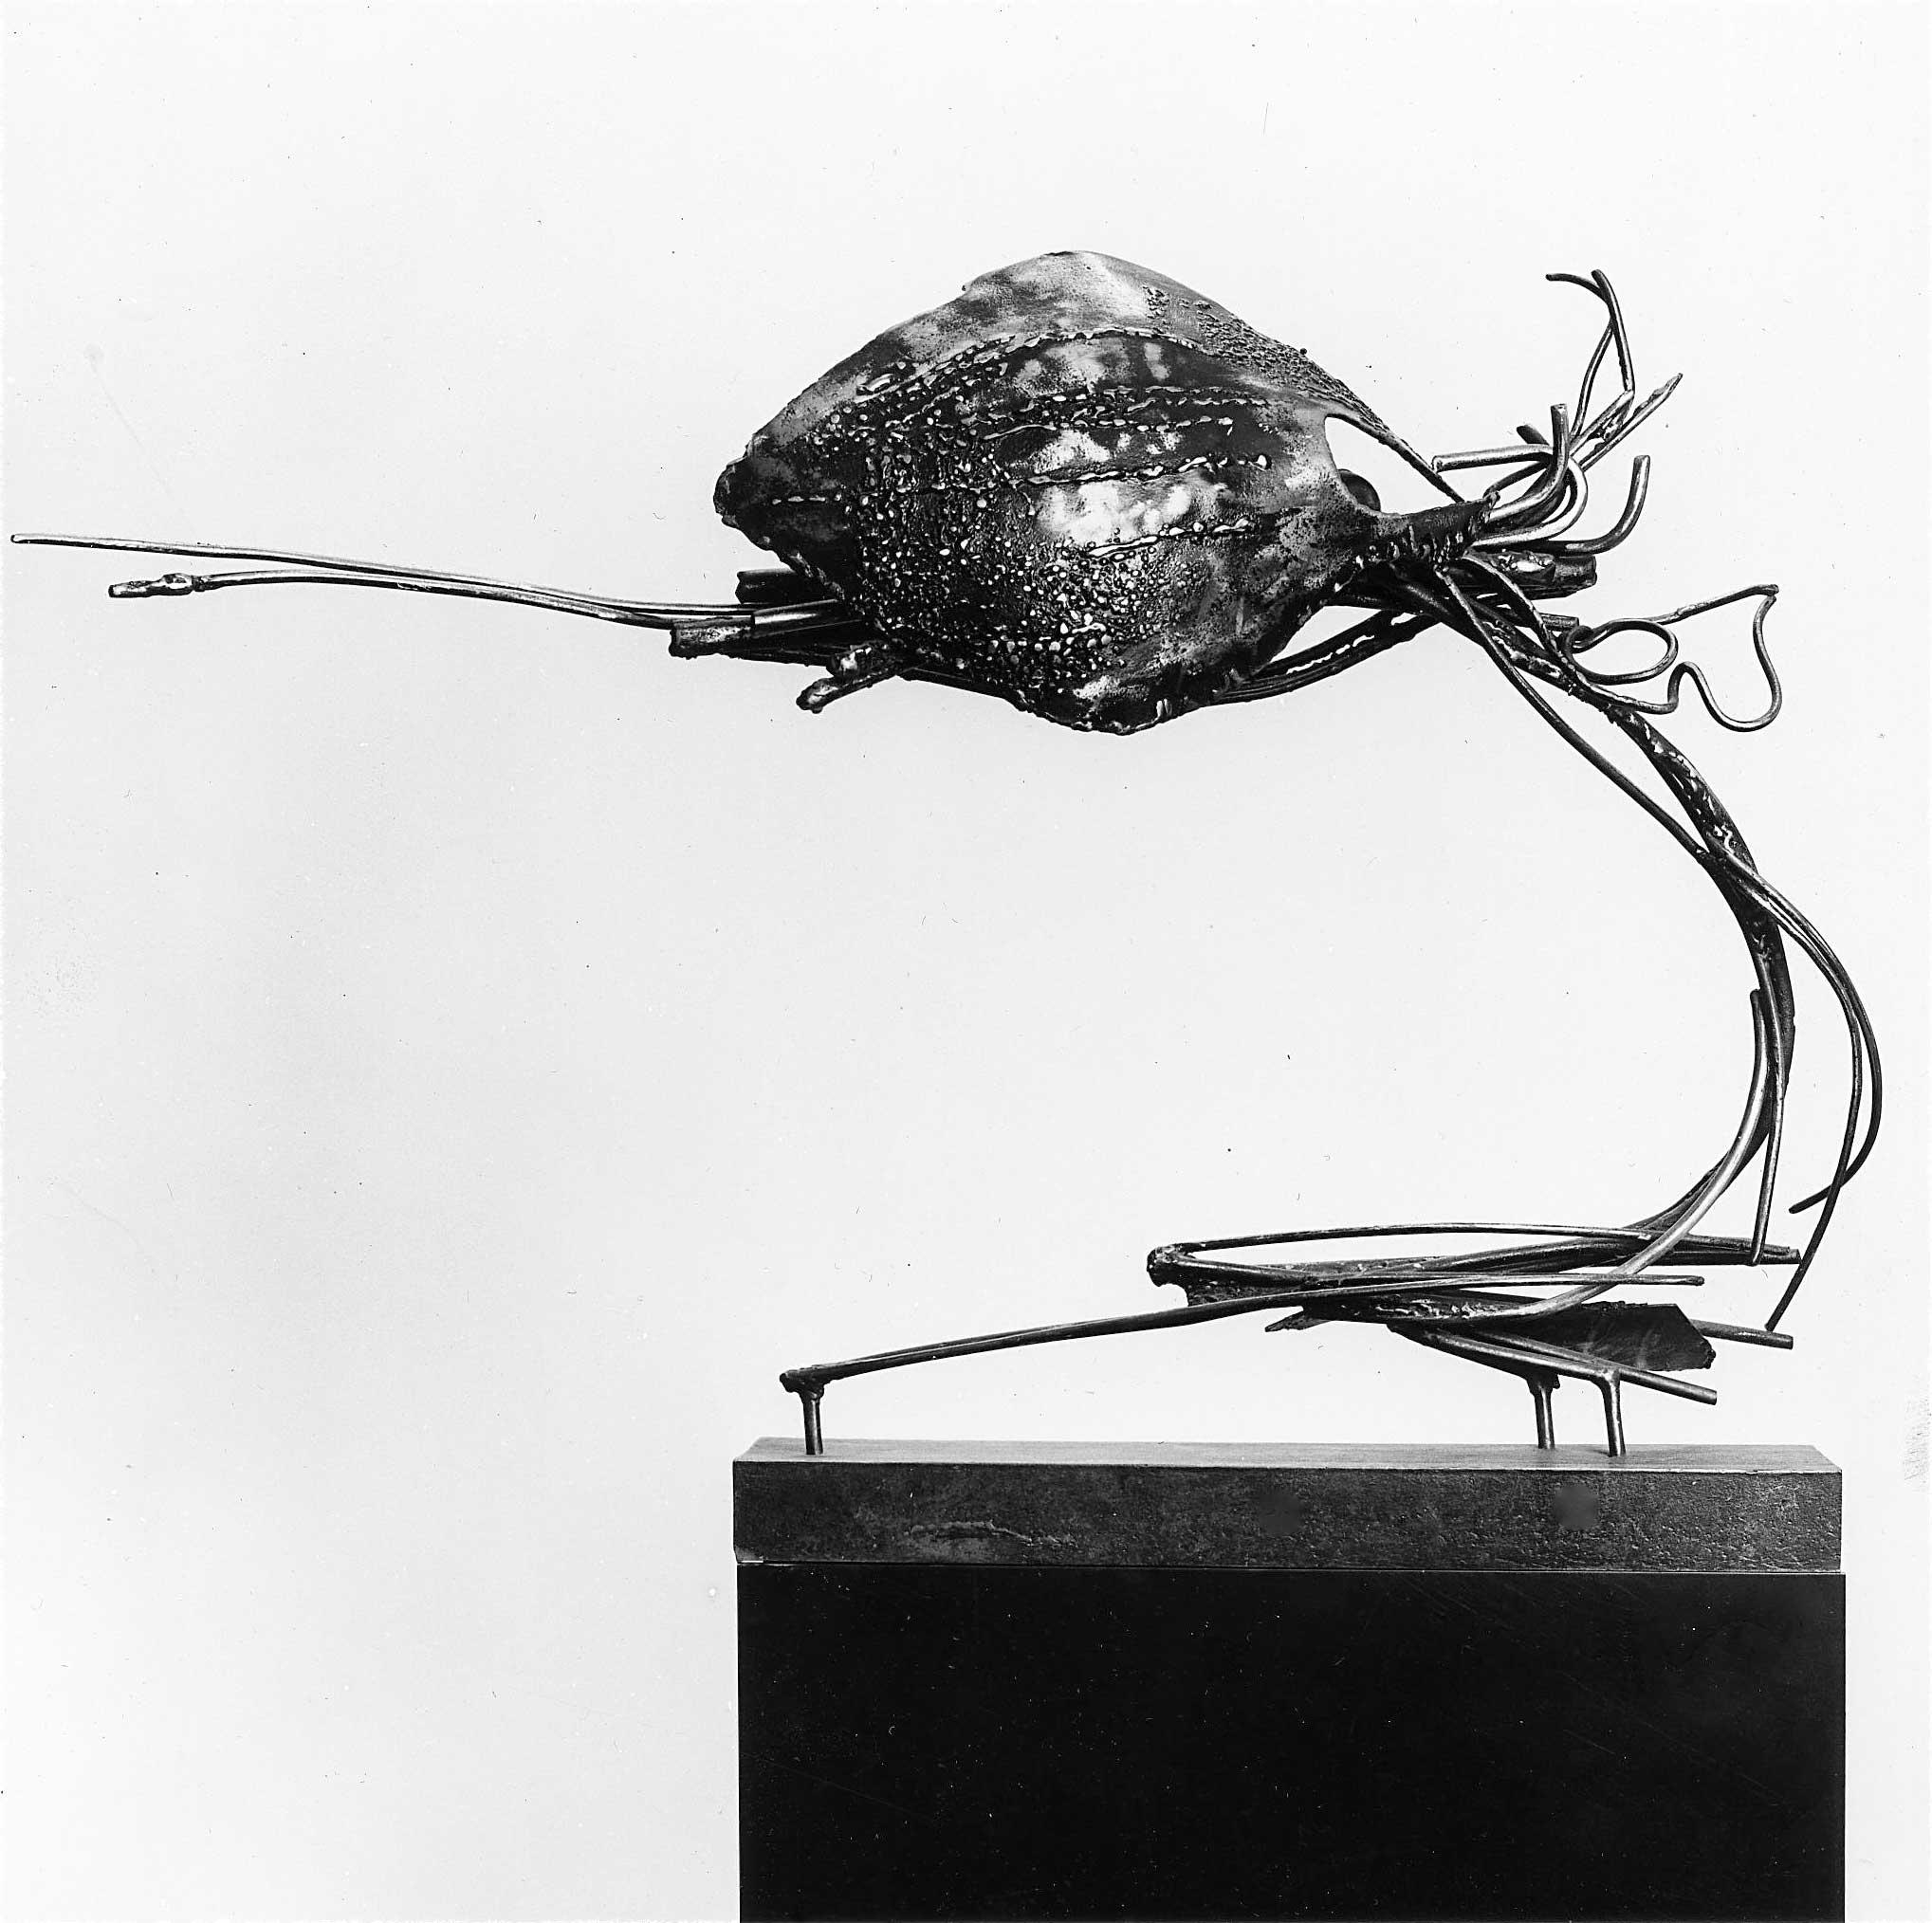 Le-scarabee-01